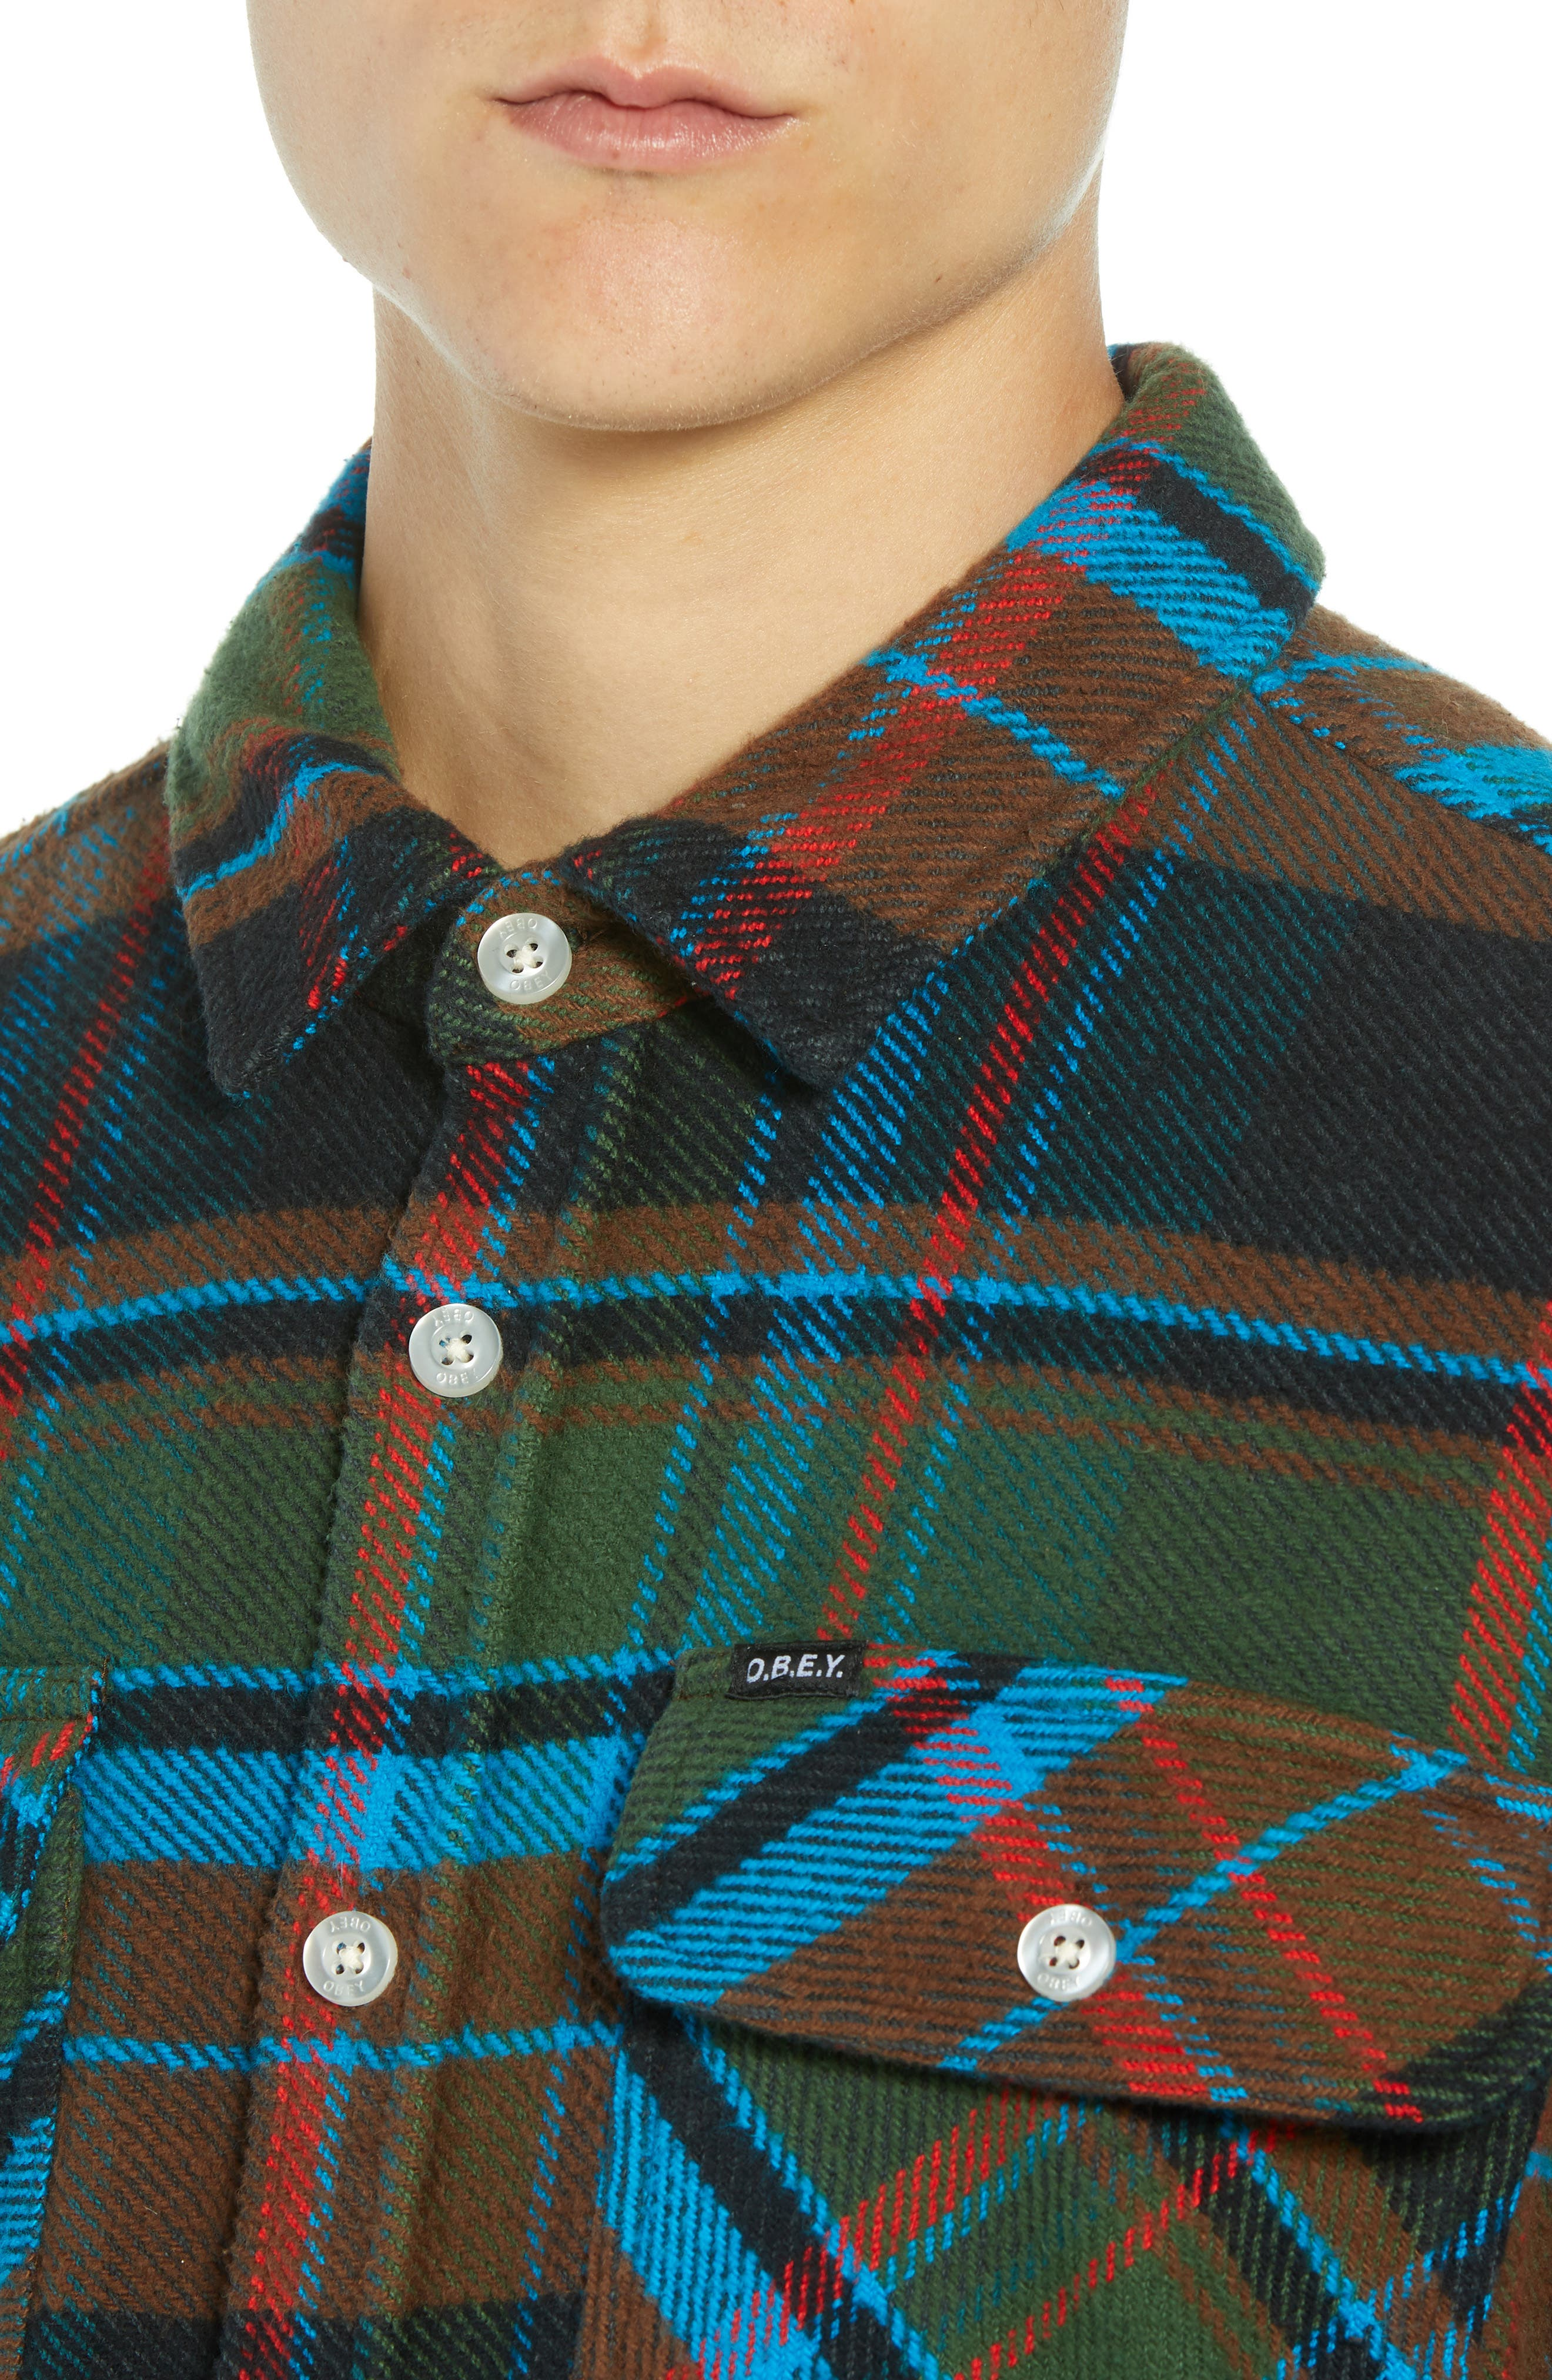 Homebound Heavy Plaid Flannel Shirt Jacket,                             Alternate thumbnail 2, color,                             BLACK FORREST MULTI